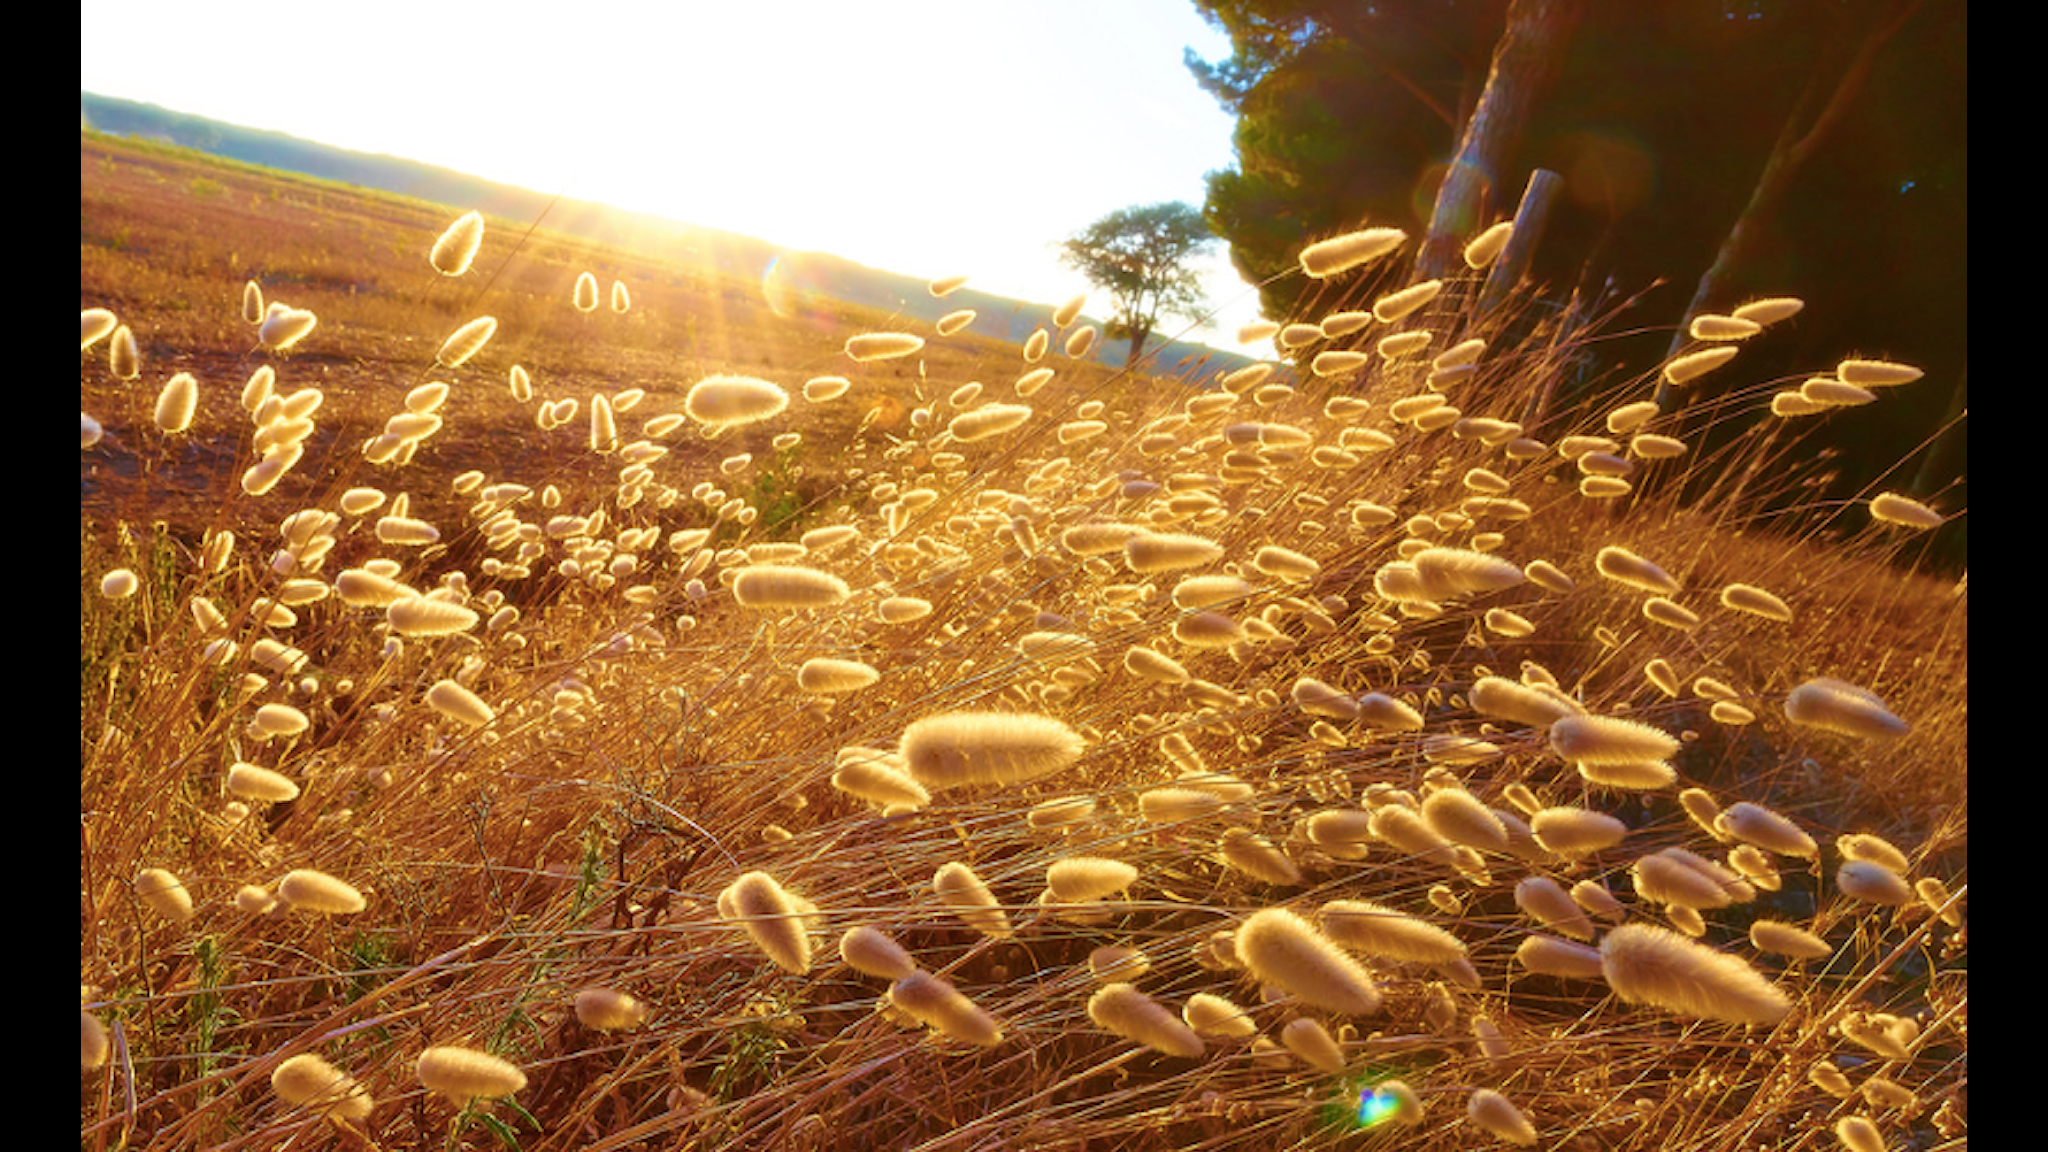 Foto: Moyan Brenn Flickr Creative Commons